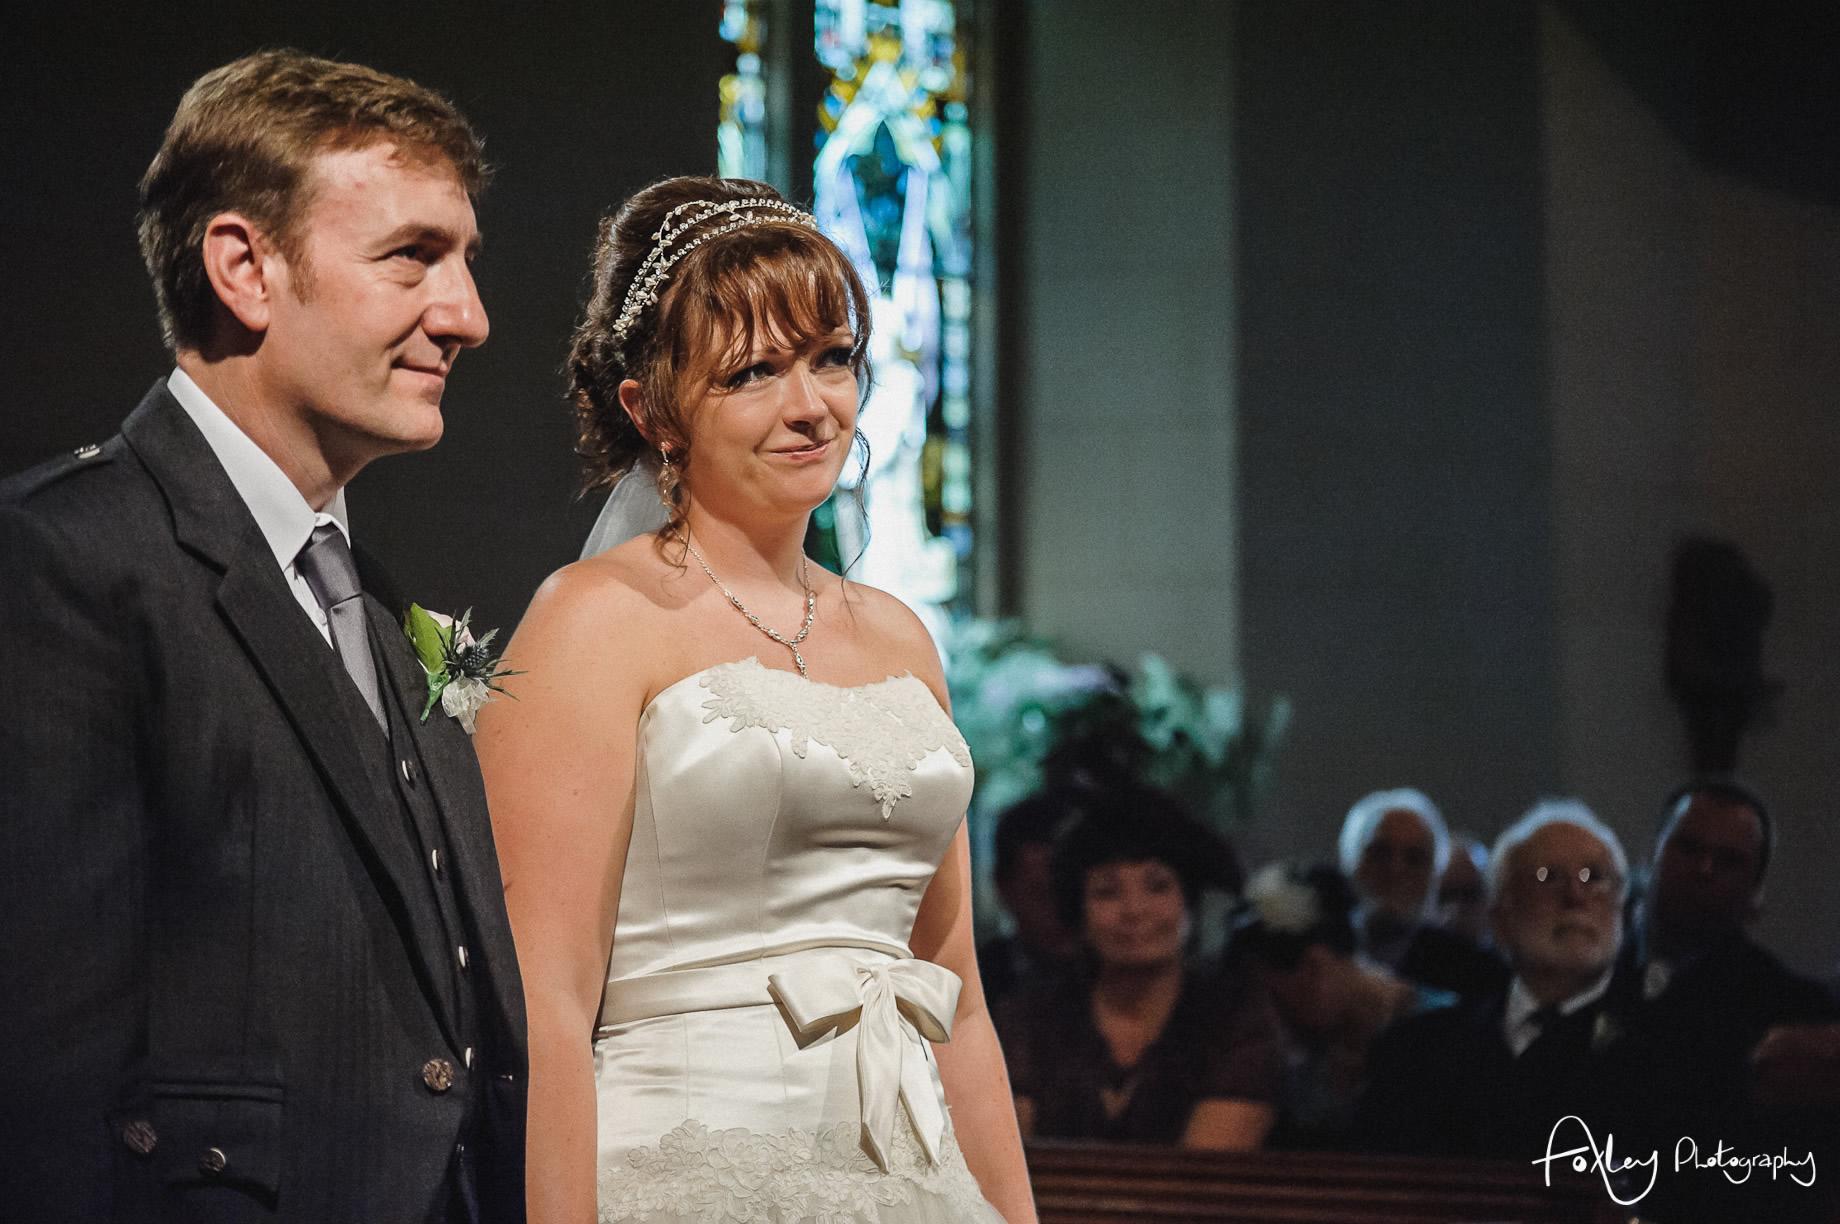 Alys-And-Davids-Wedding-Loch-Lomond-094